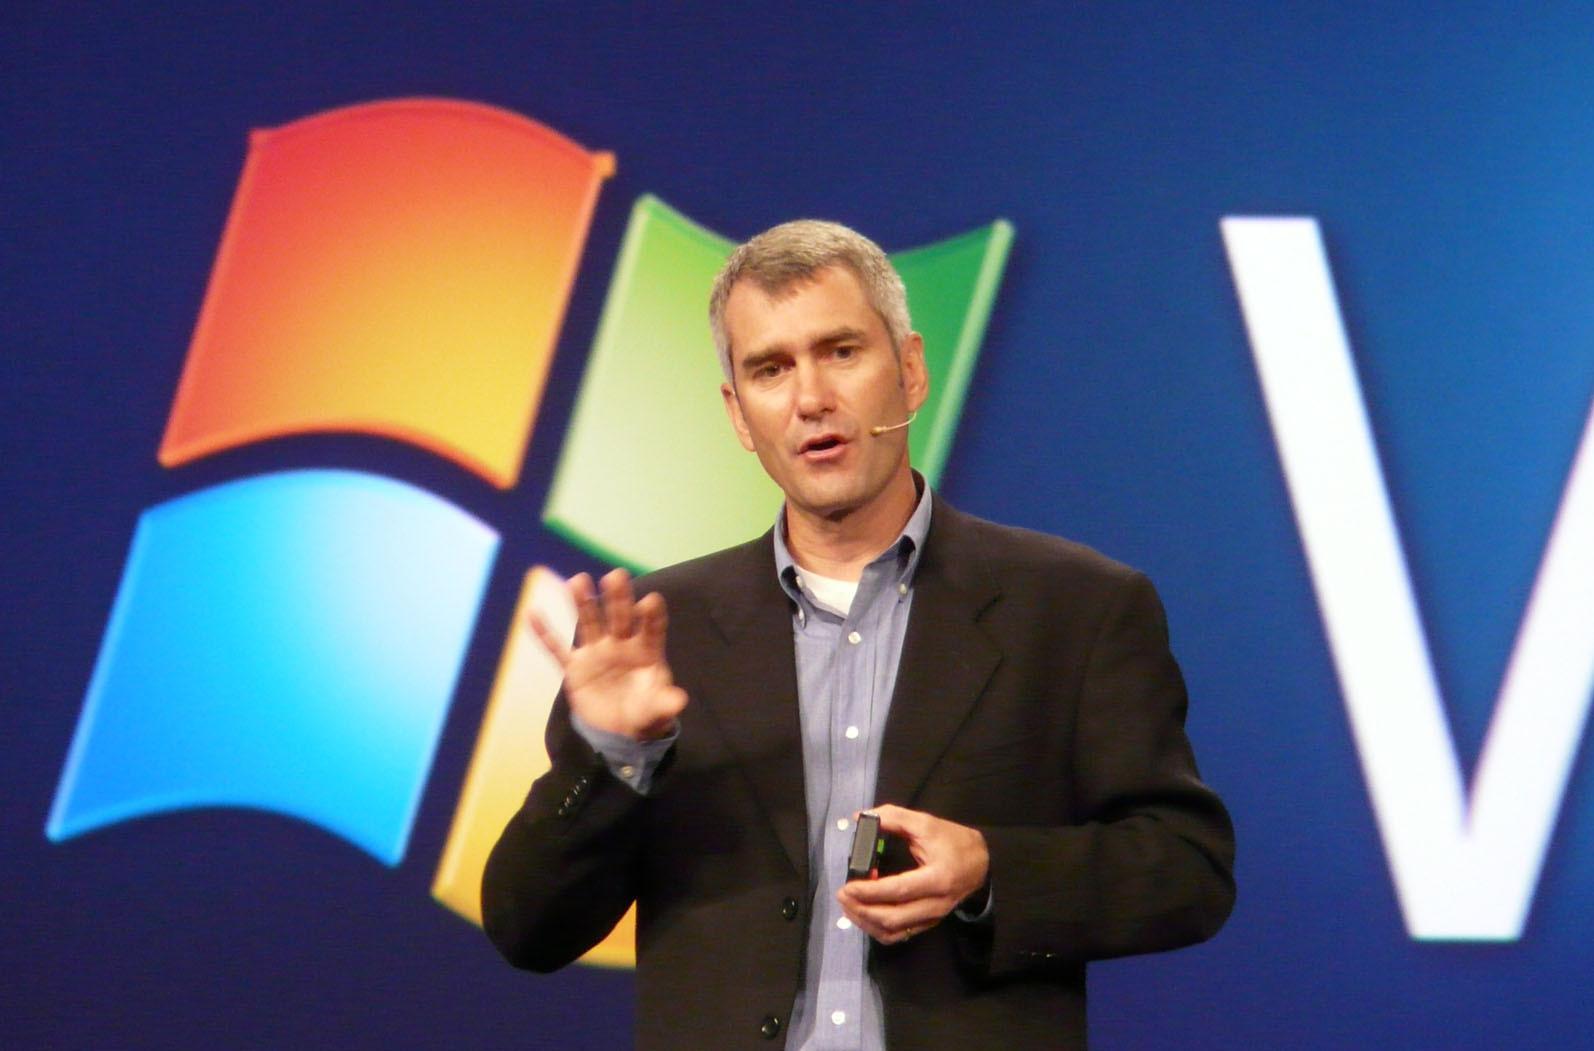 Bill Veghte, SVP Windows Business, Microsoft